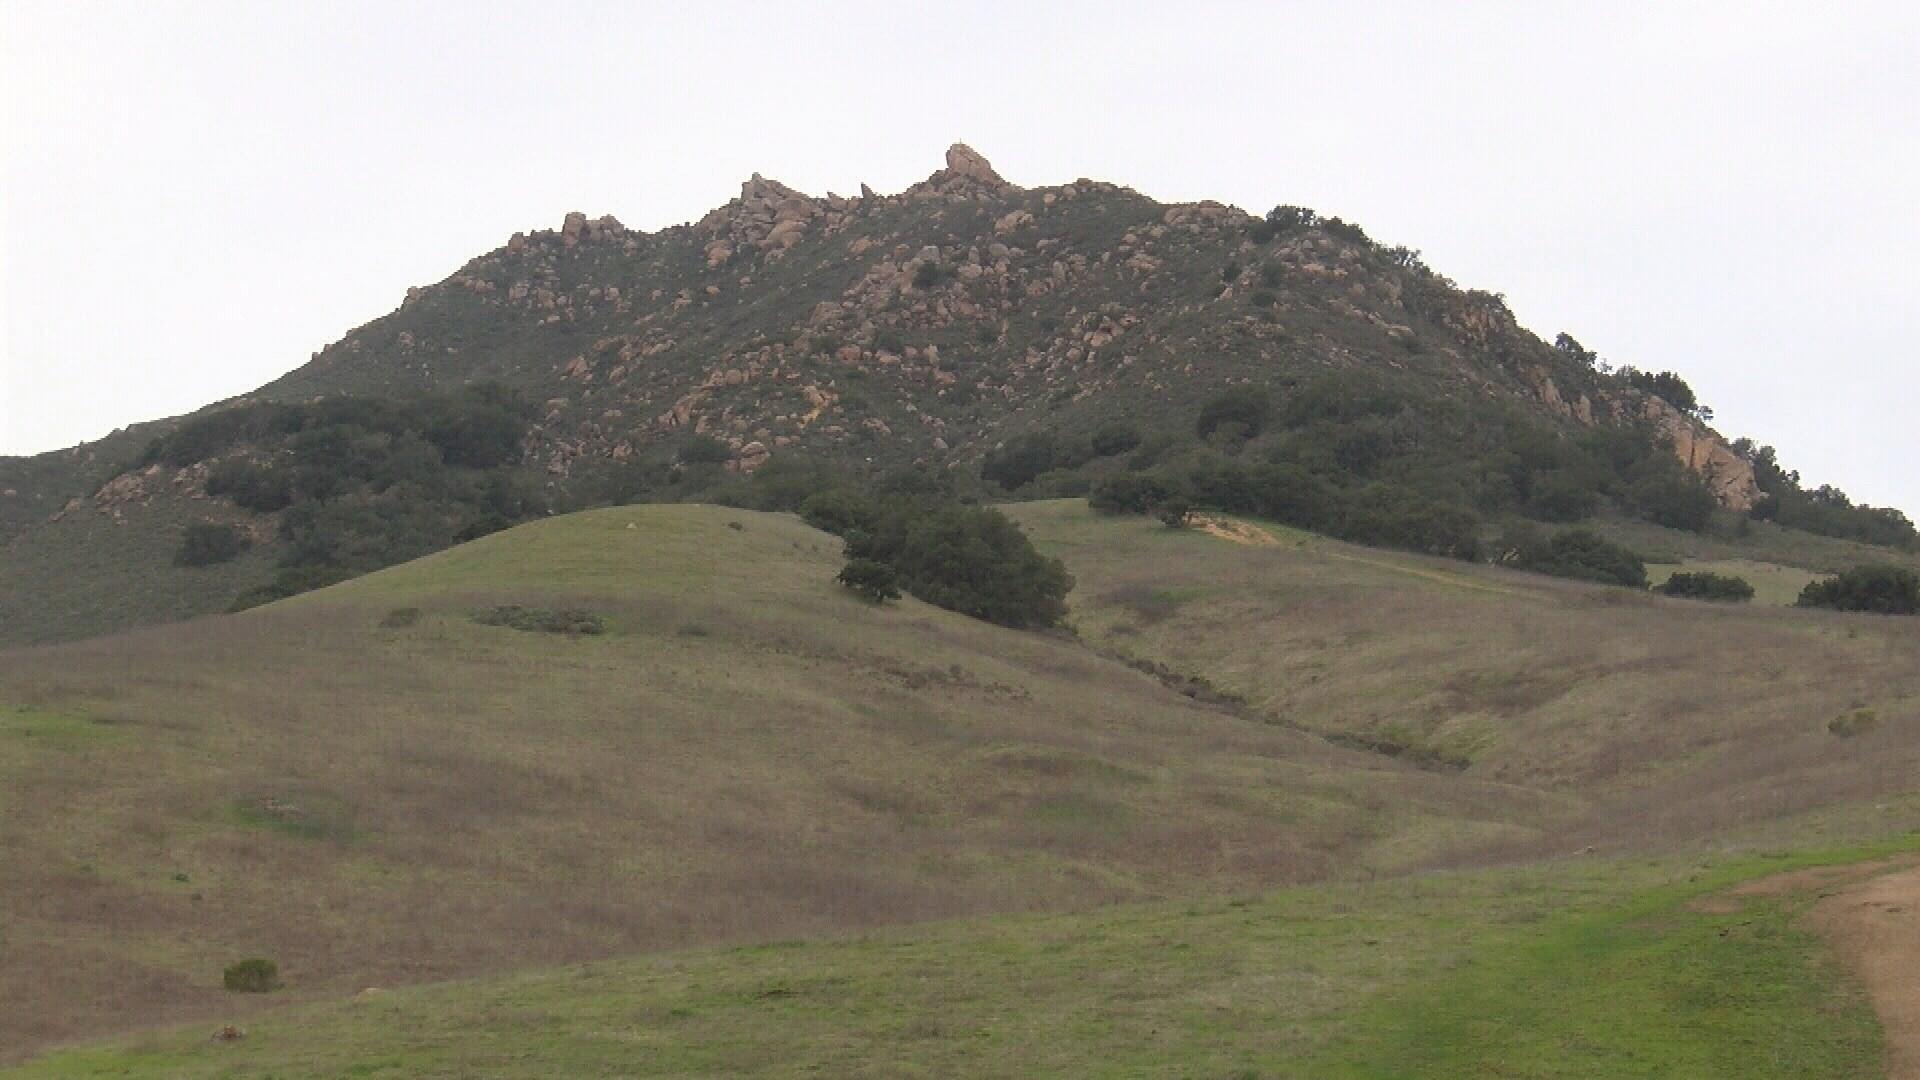 Bishop Peak, San Luis Obispo (KSBY photo)